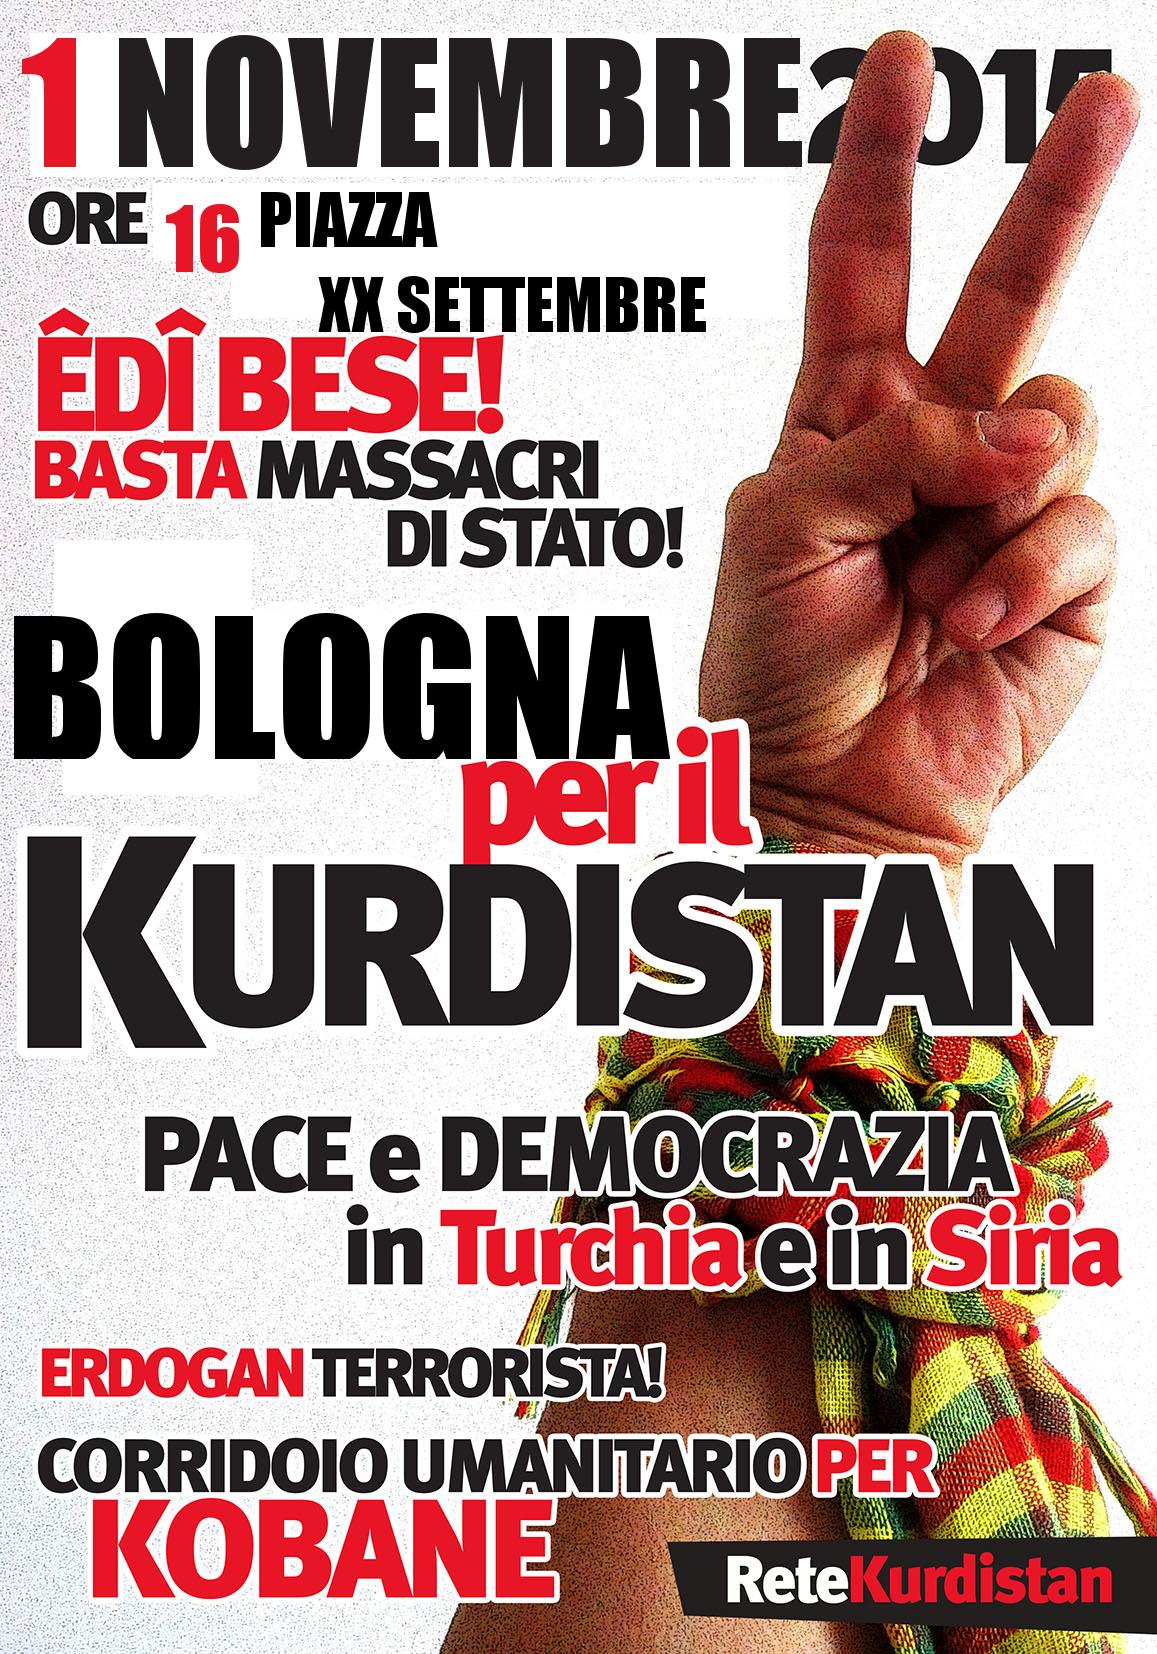 BOLOGNAperKurdistan ddd